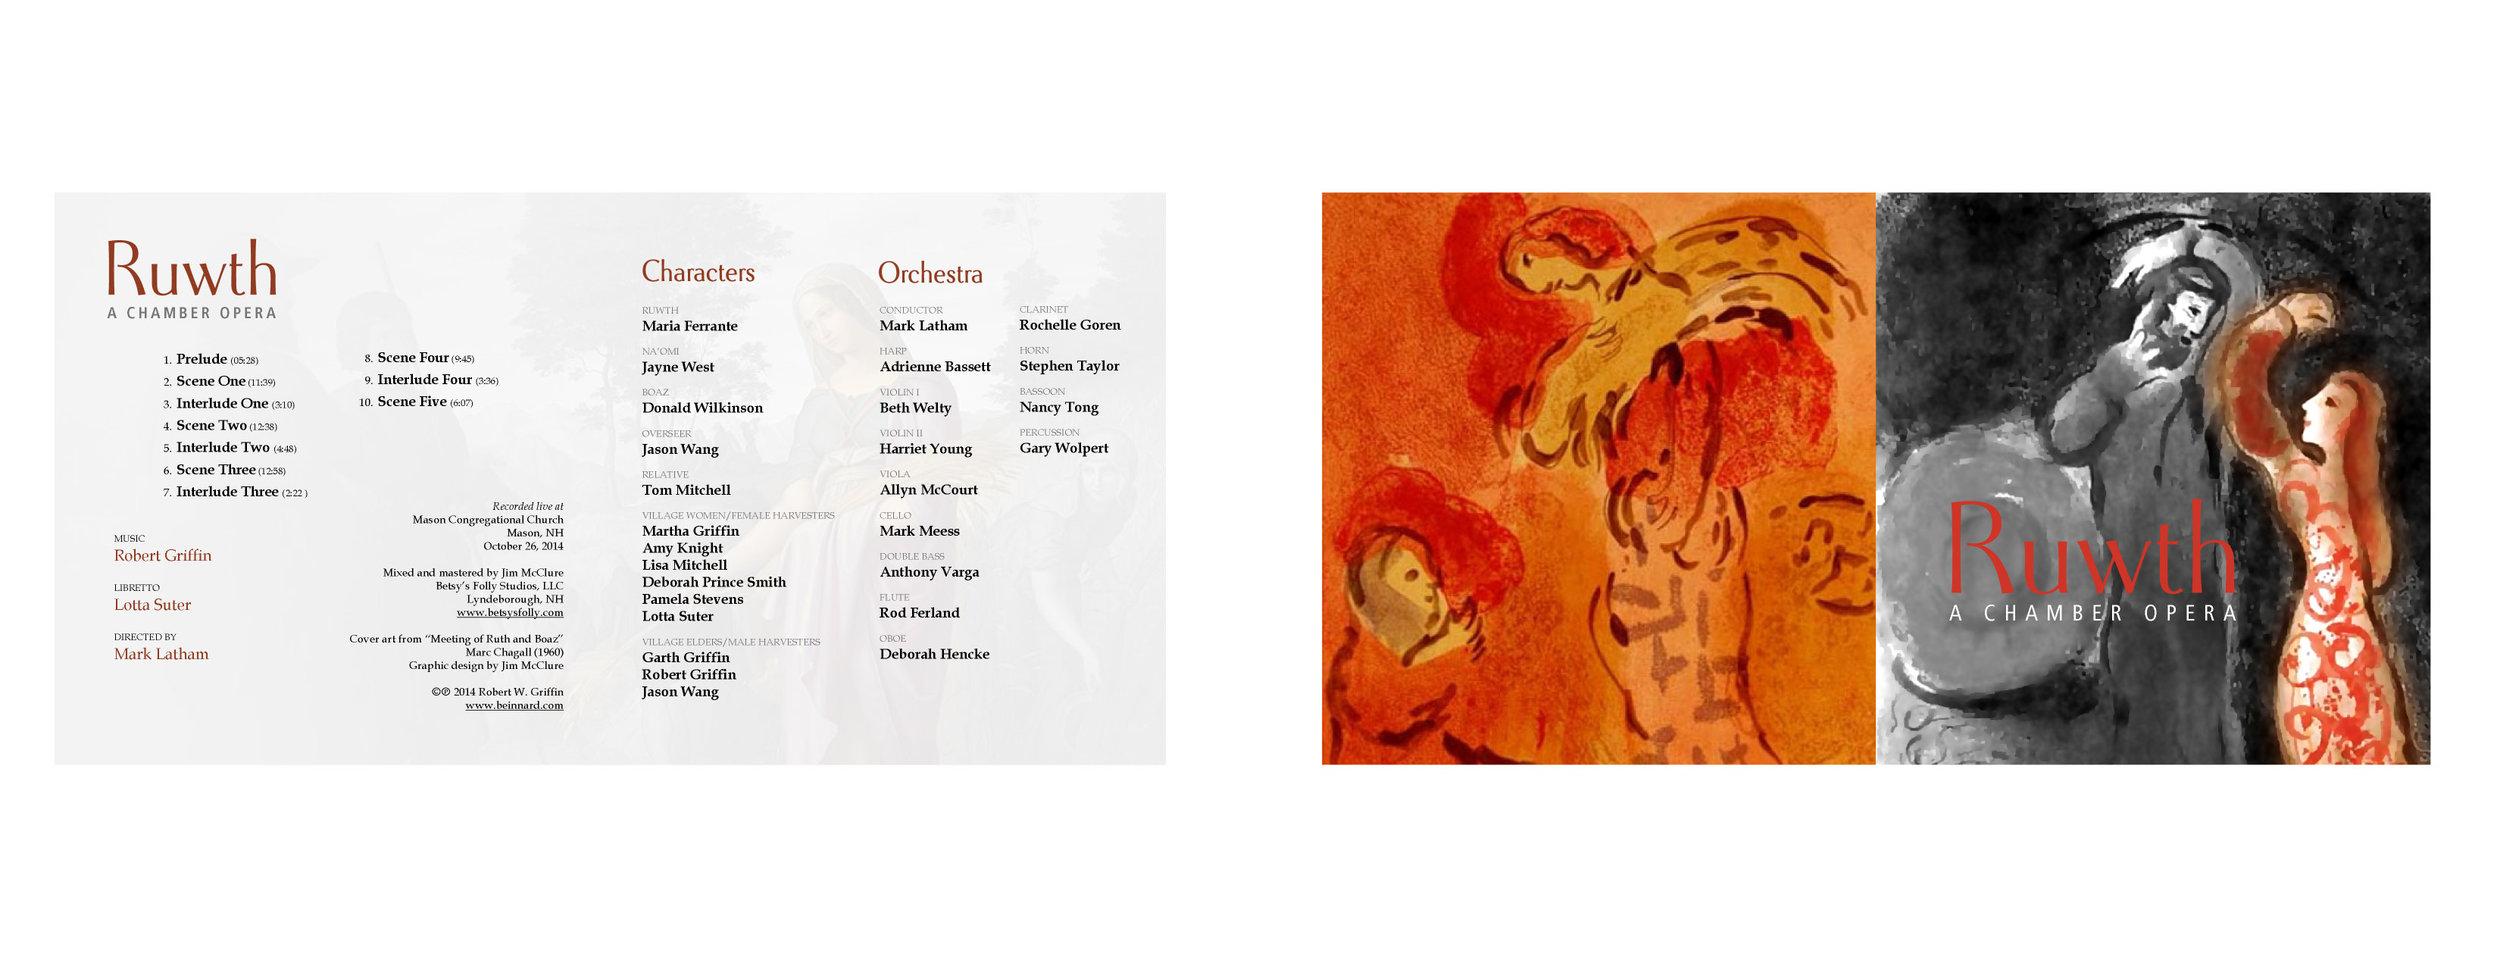 Ruwth-4pp-Booklet-Both-Sides-01.jpg